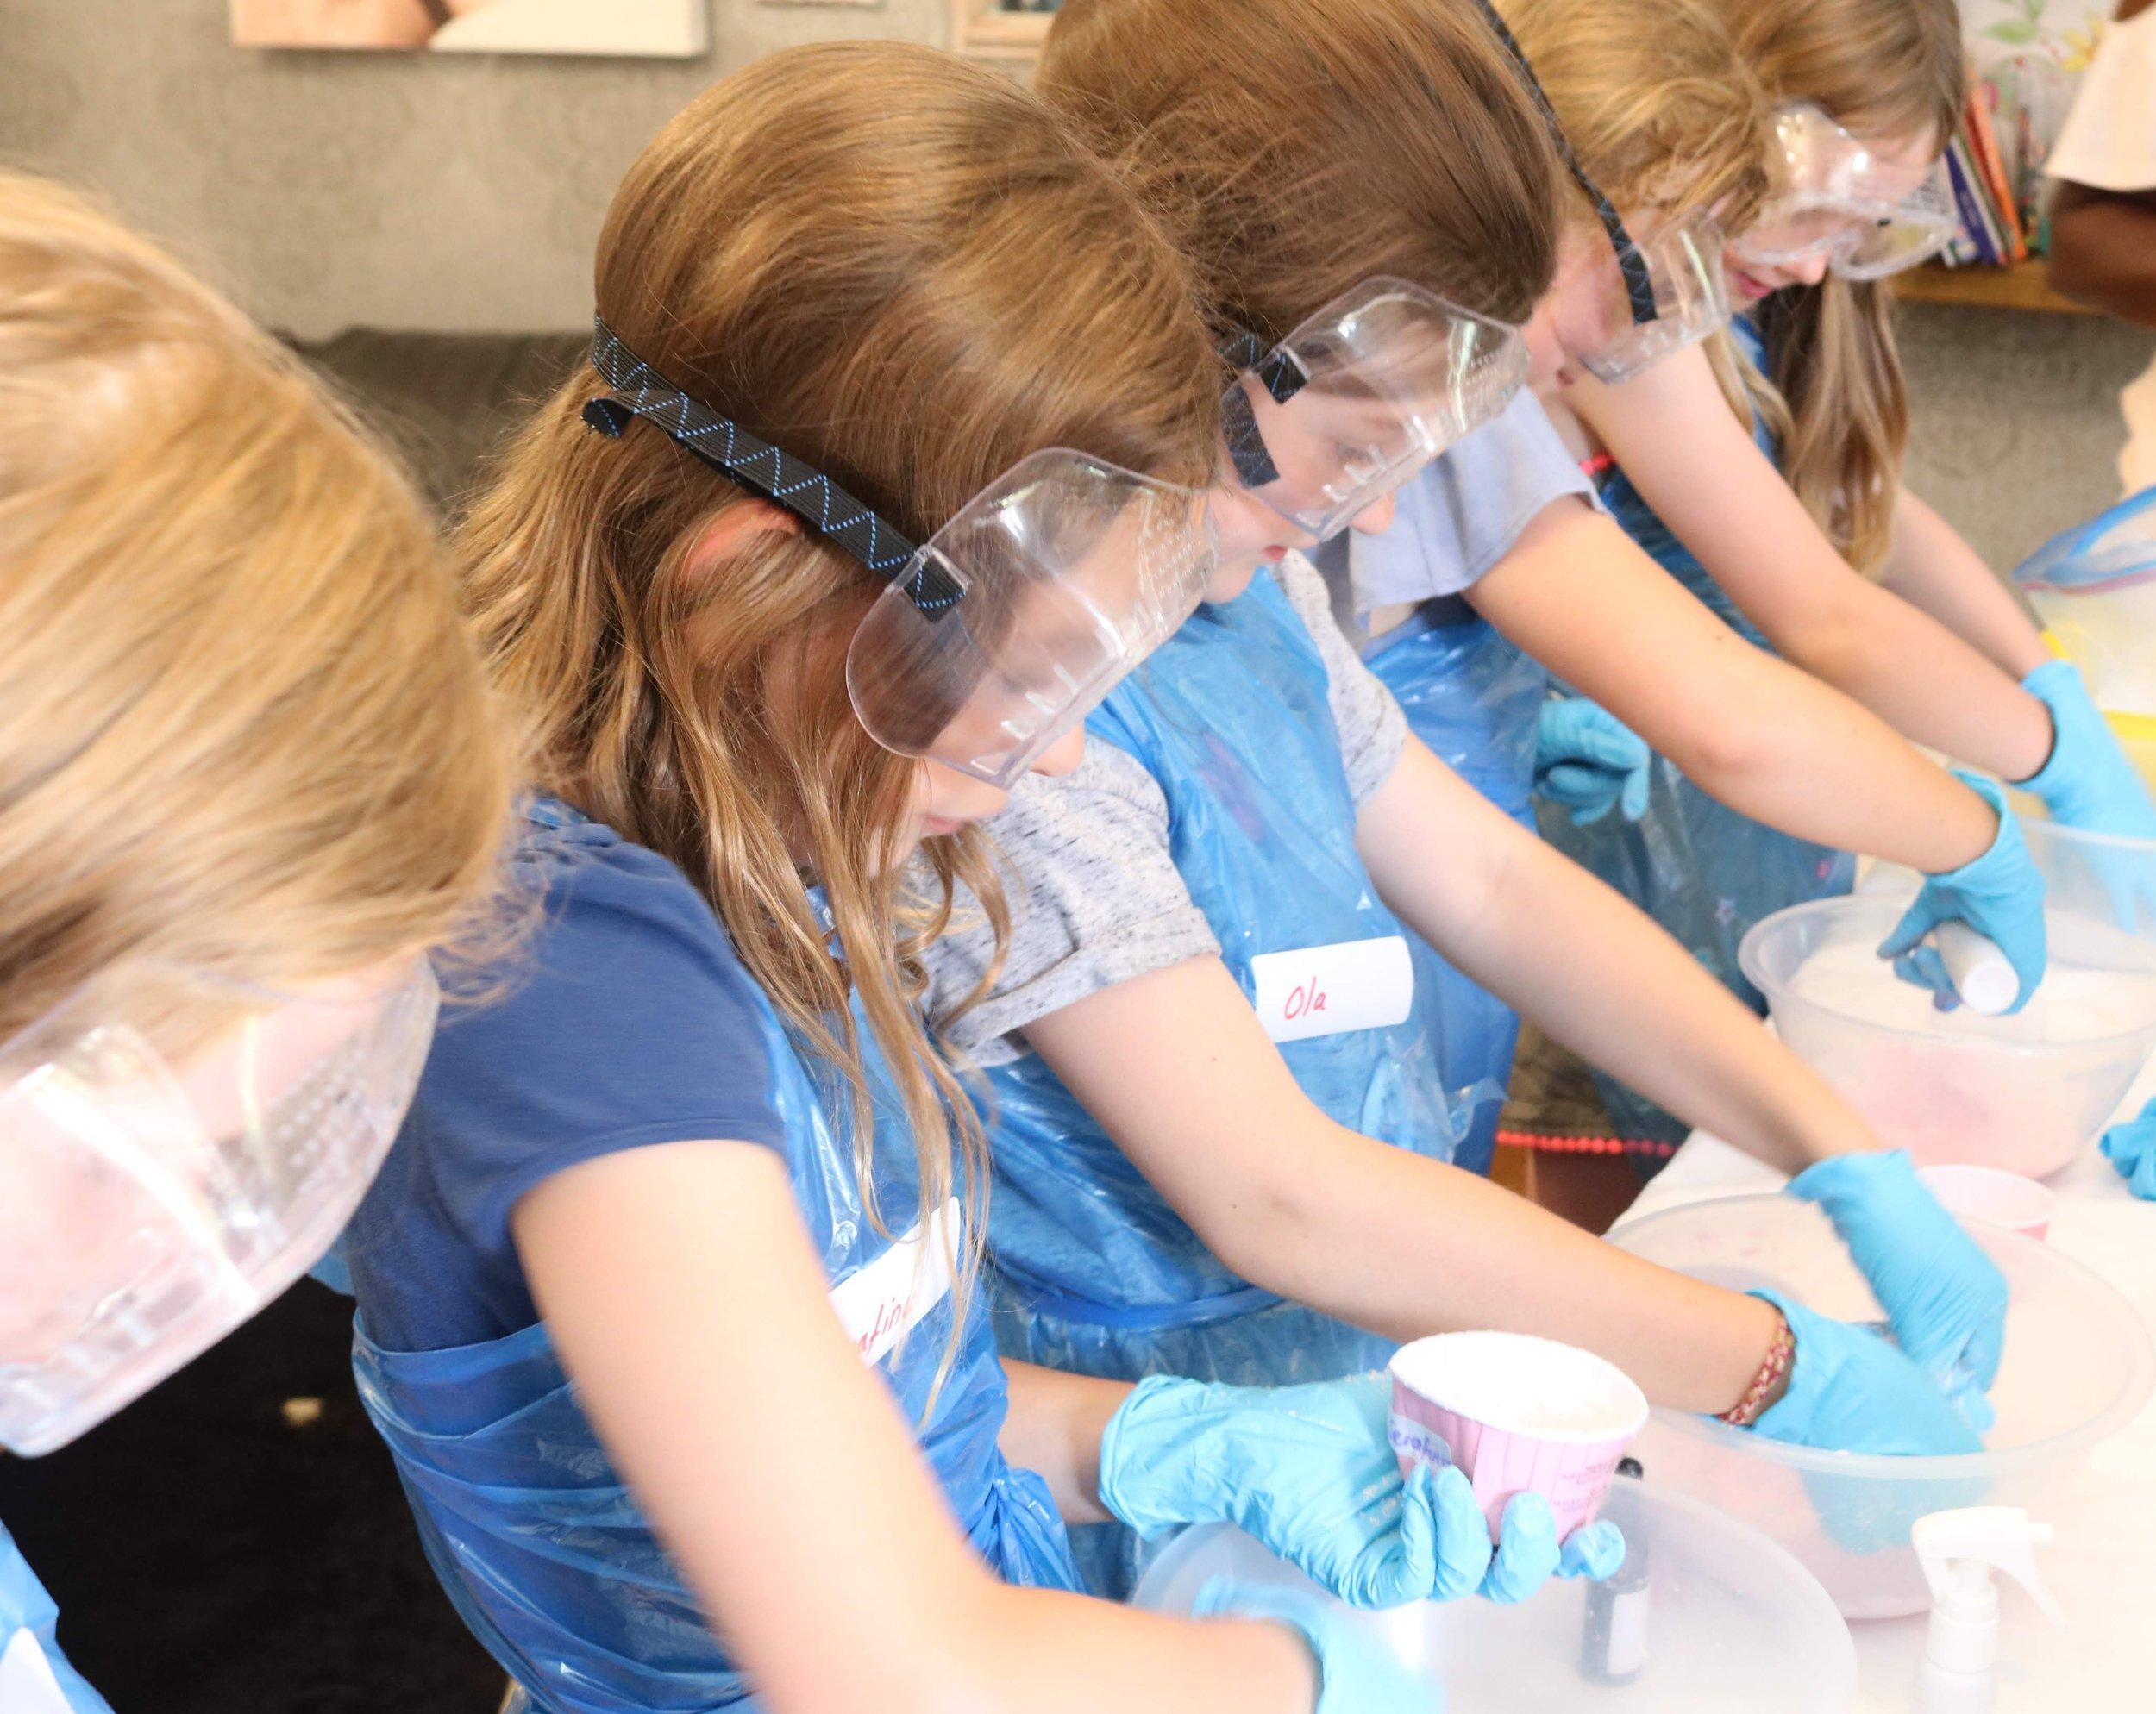 Girls making bath bombs